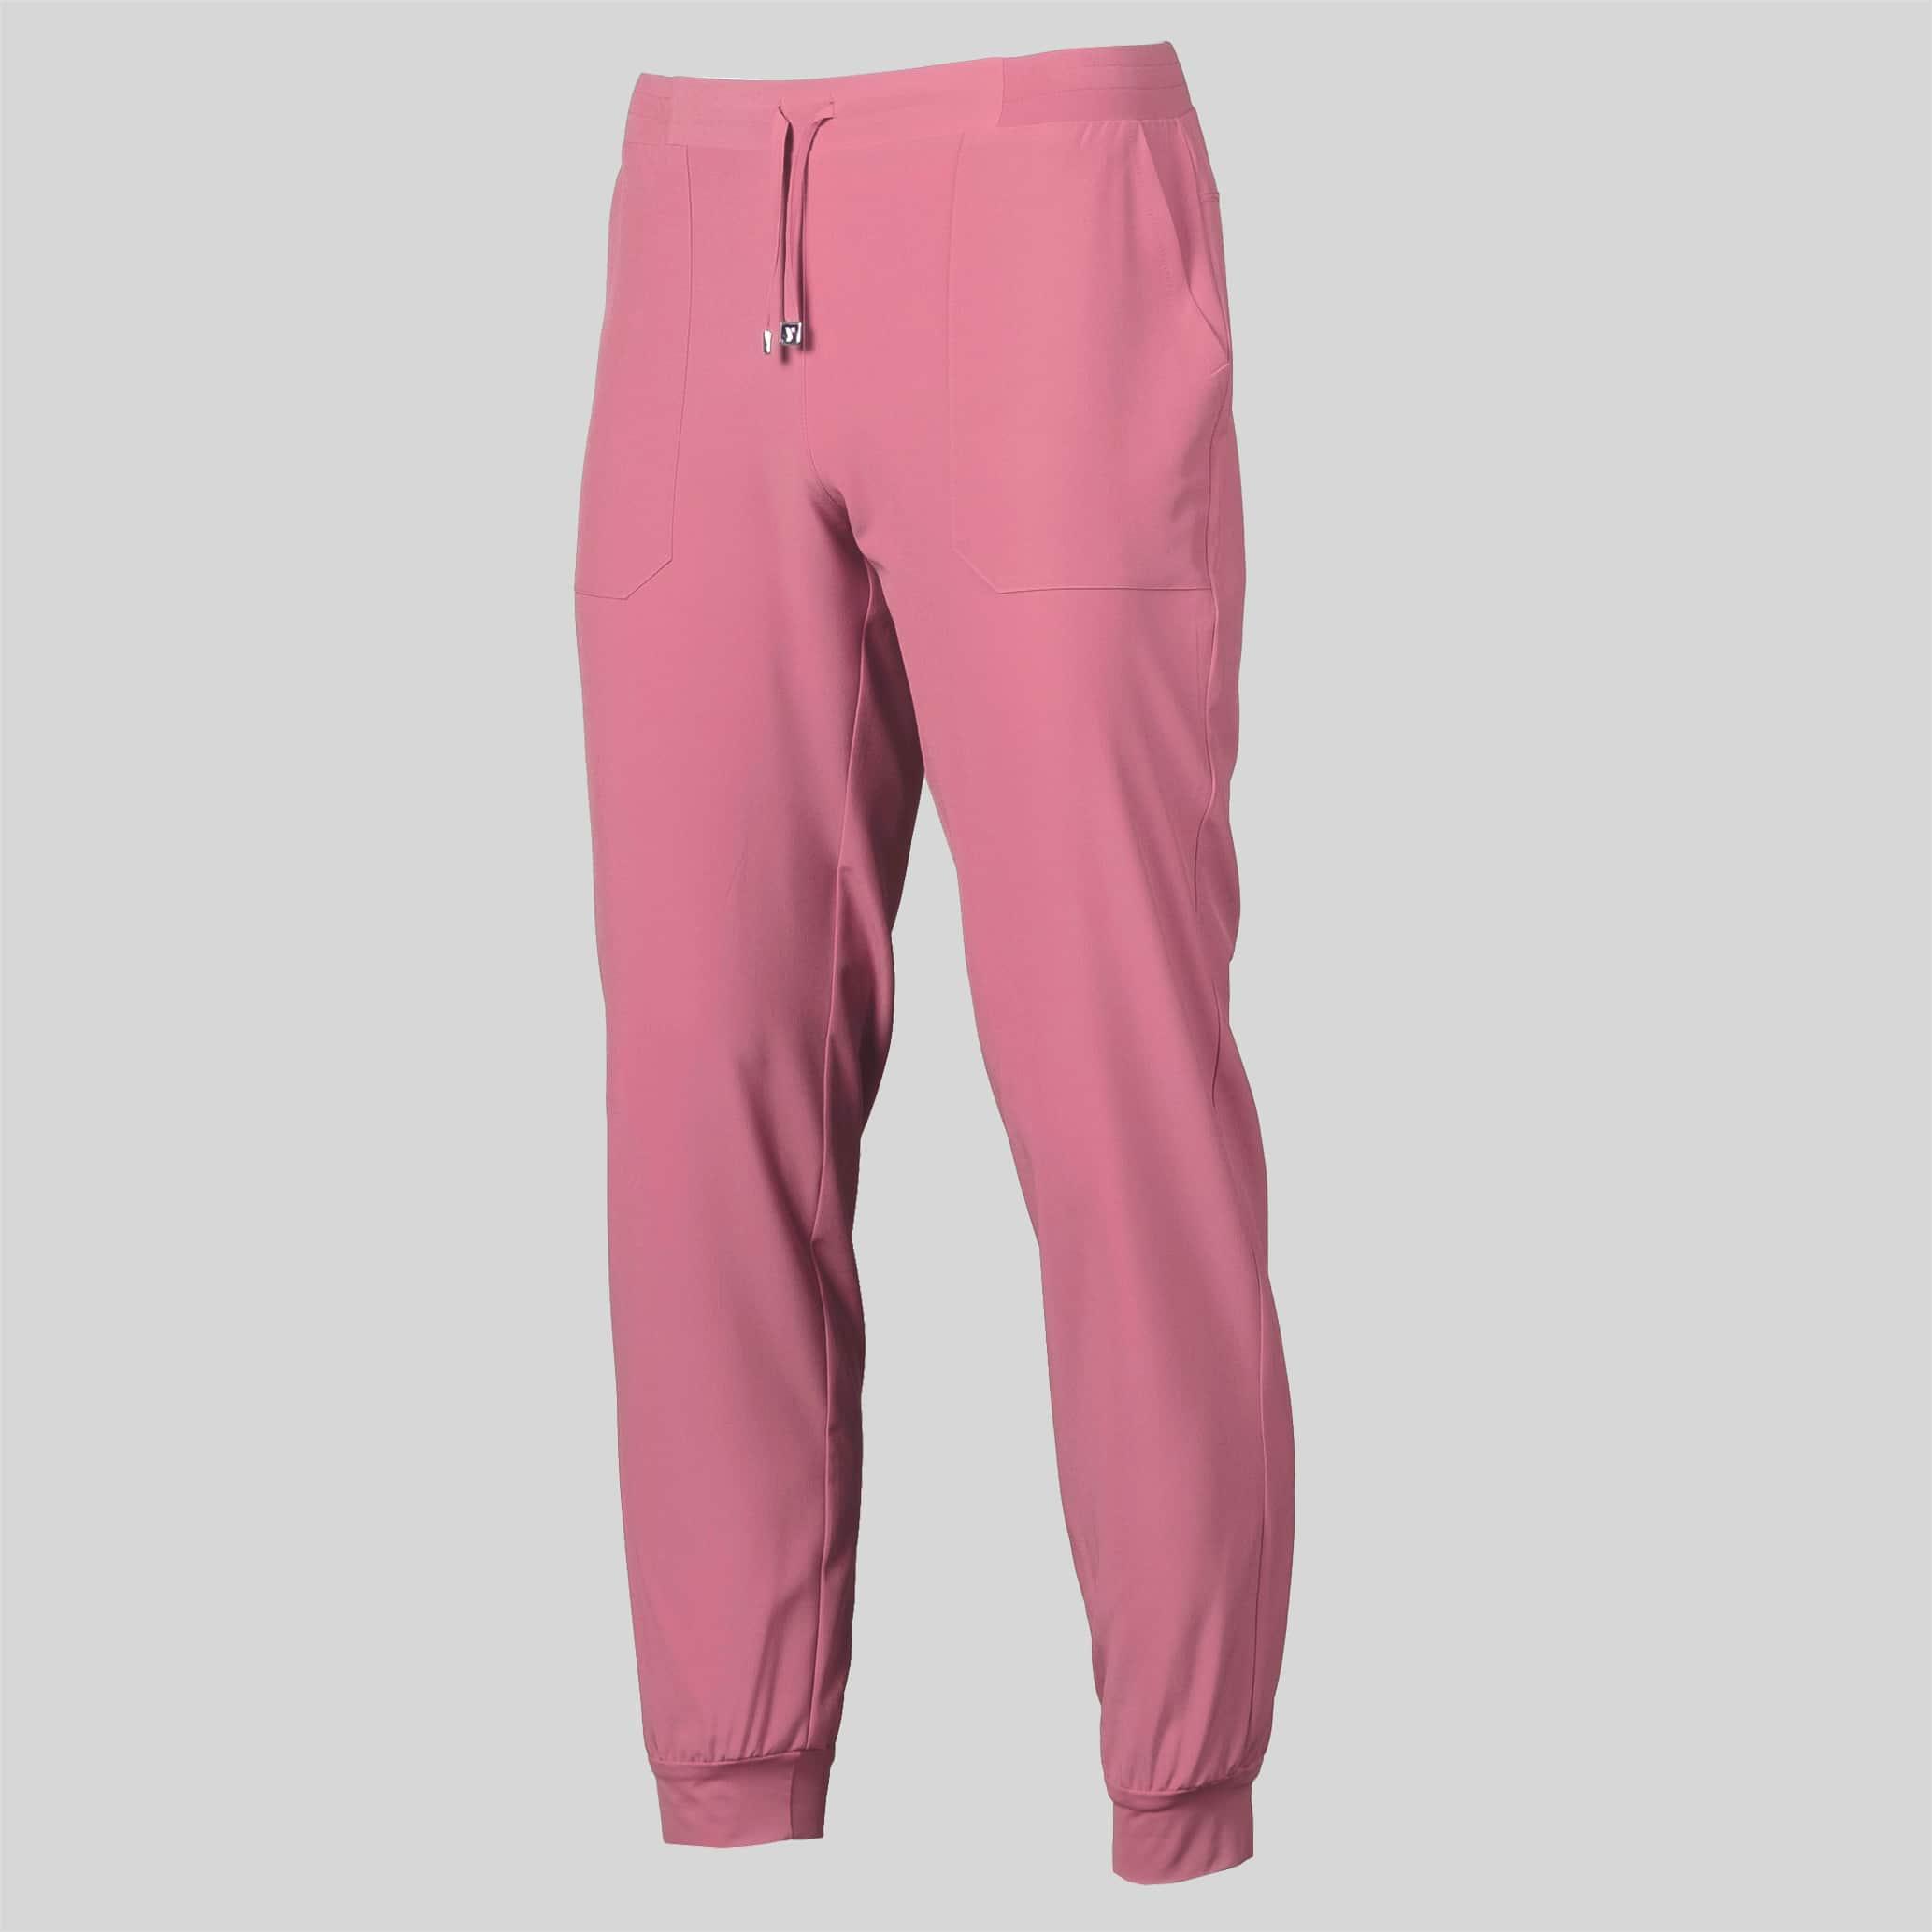 Gary´s 704700 Pantalon Unisex Jogger Rosa